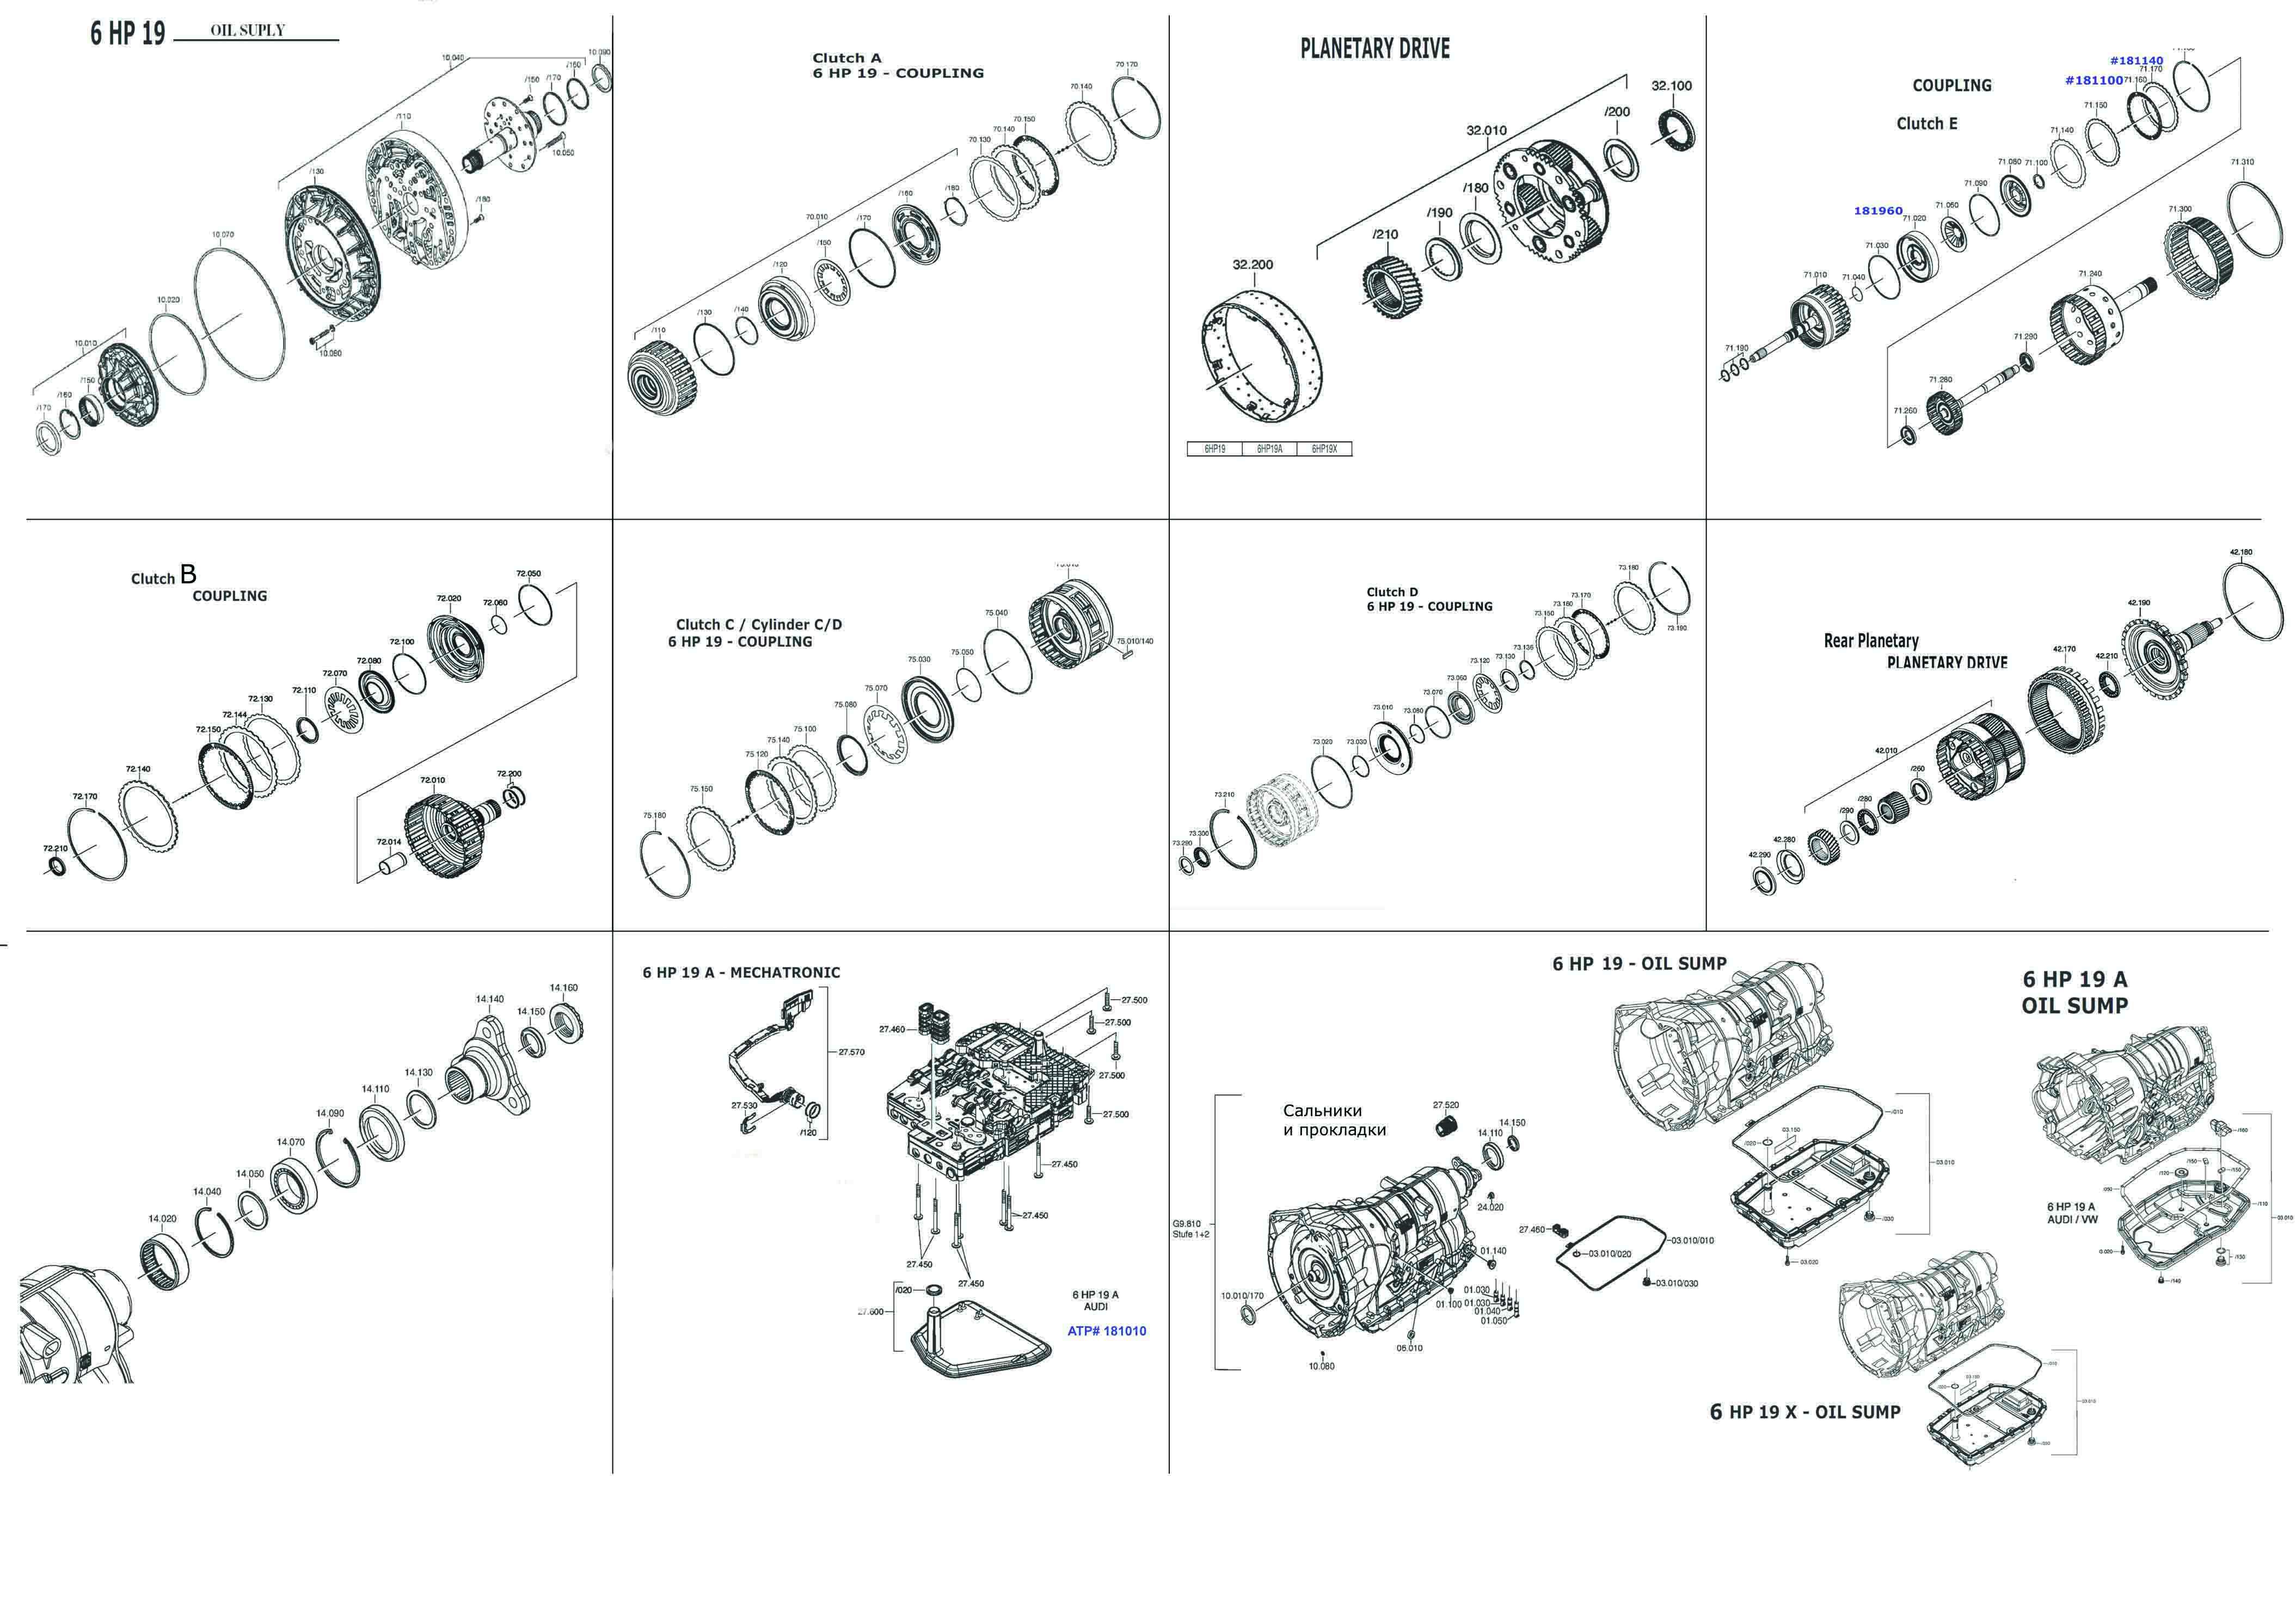 Transmission Repair Manuals 09l Zf 6hp19 Instructions